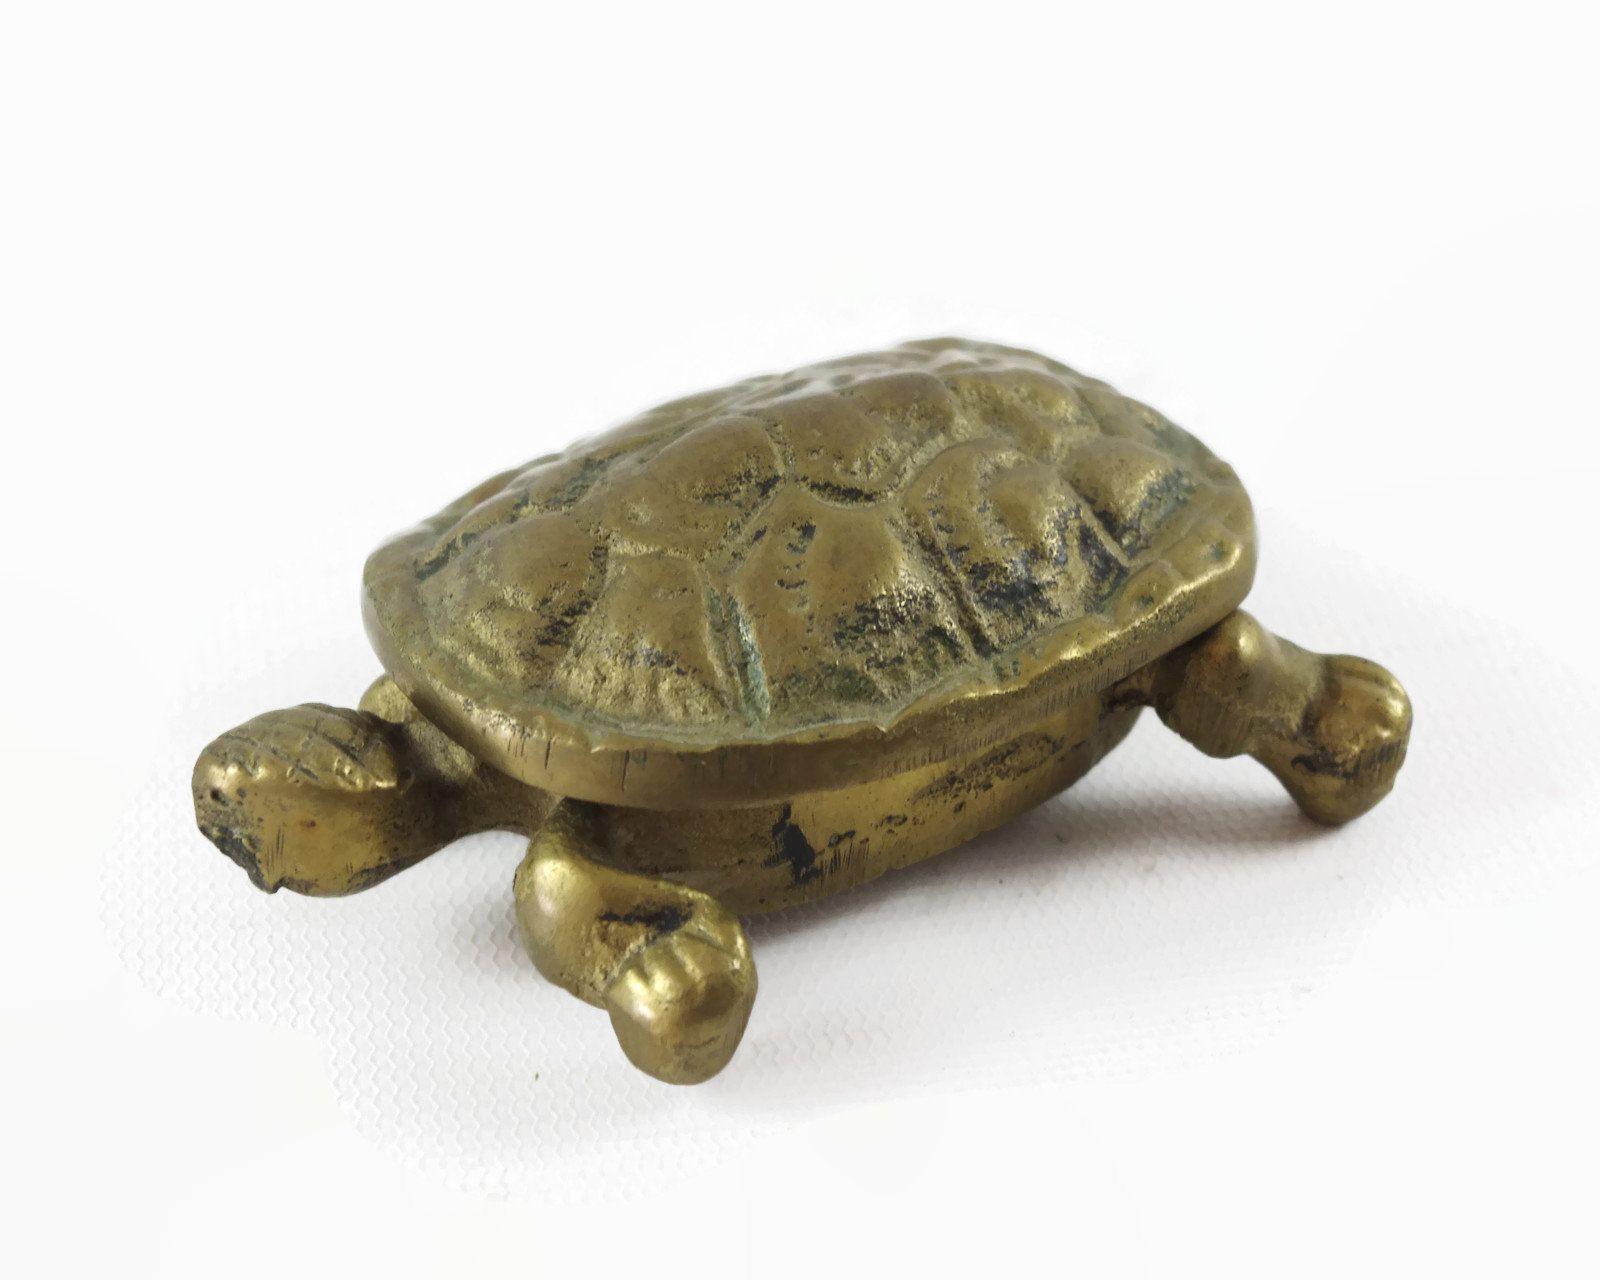 Brass Turtle Tortoise Jewelry Box Vintage Antique metal tarnish patina animal lover gift